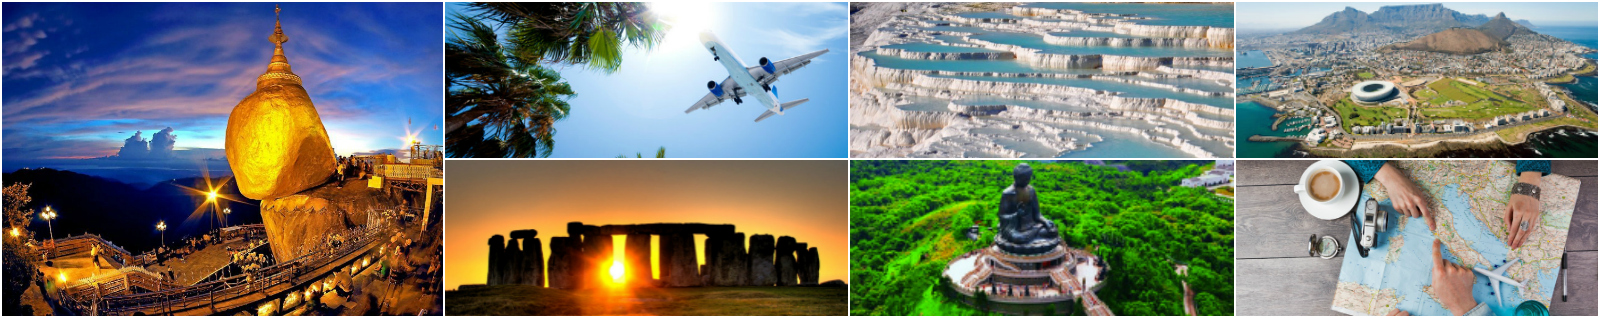 Viaja gratis con los programas de viajero frecuente